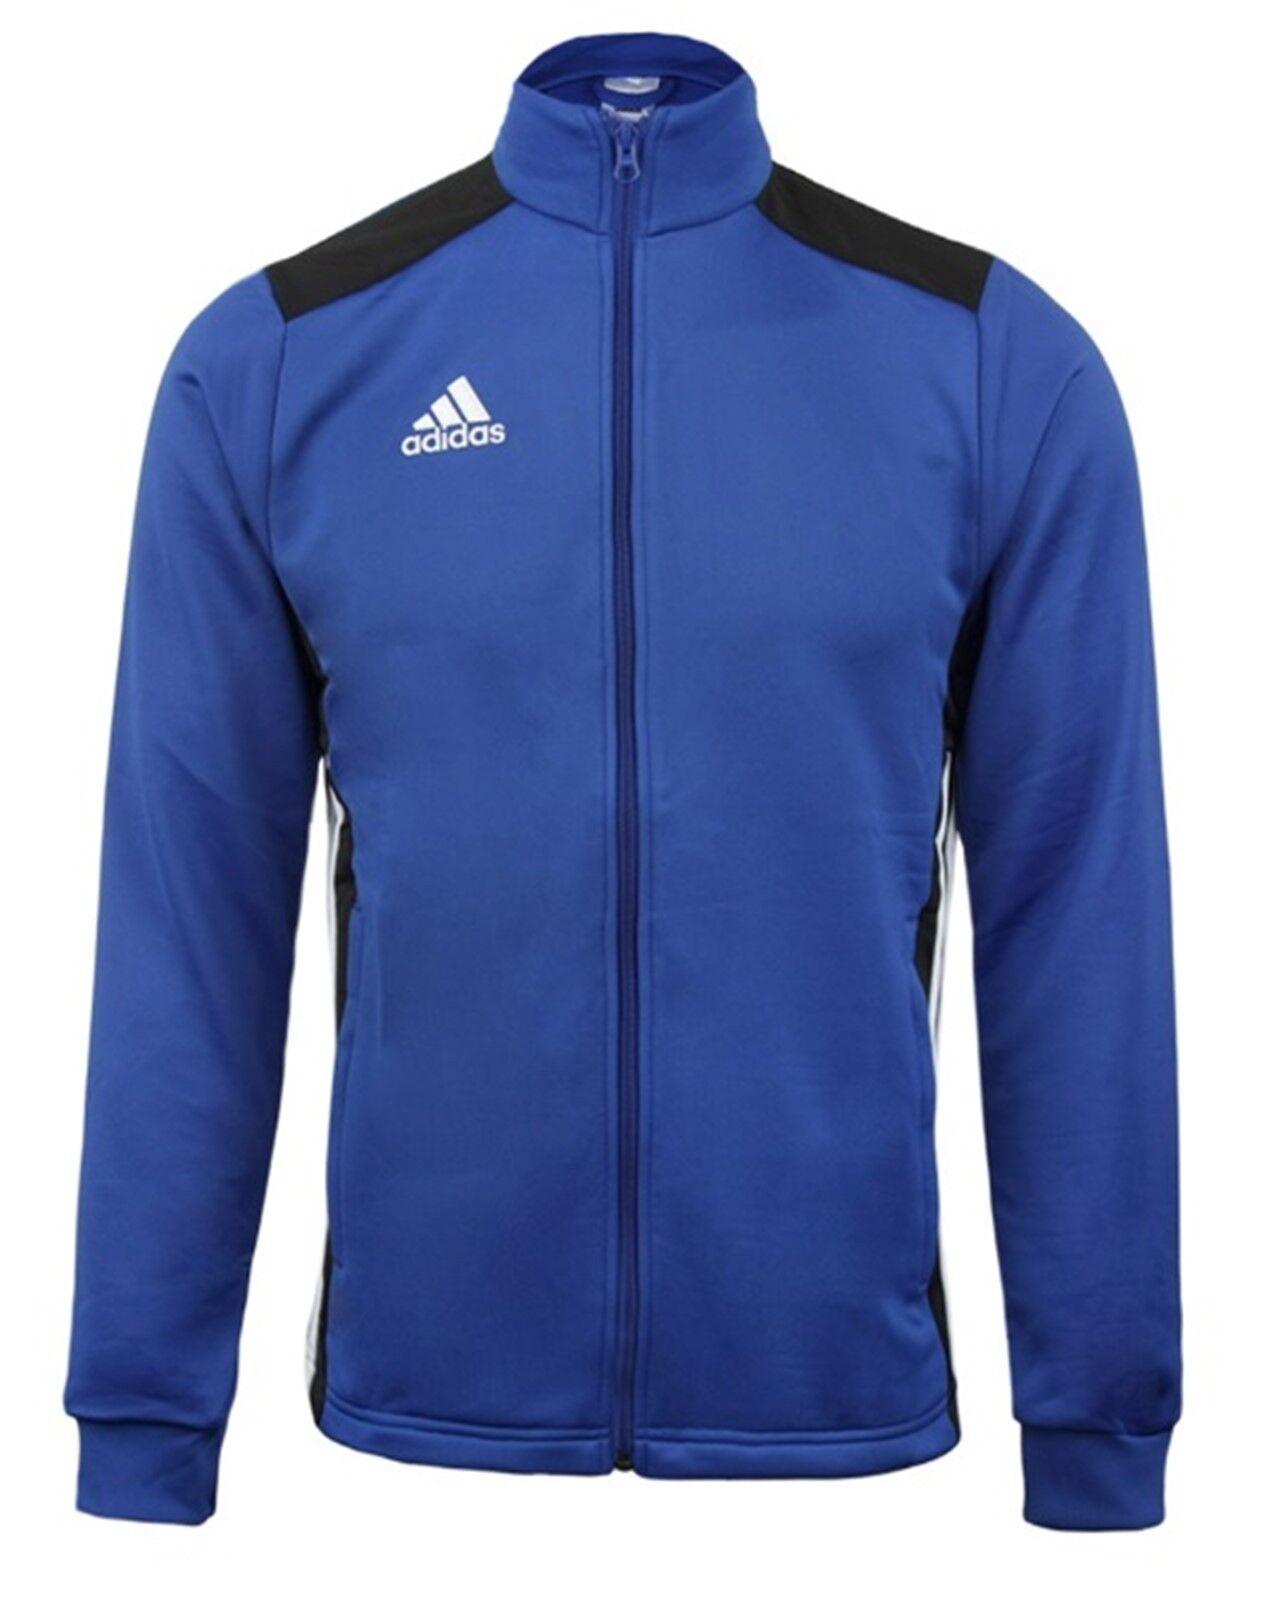 Adidas Youth Regista 18 Trainingsfußball Blue Climalite Kid Track Hemden CZ8631